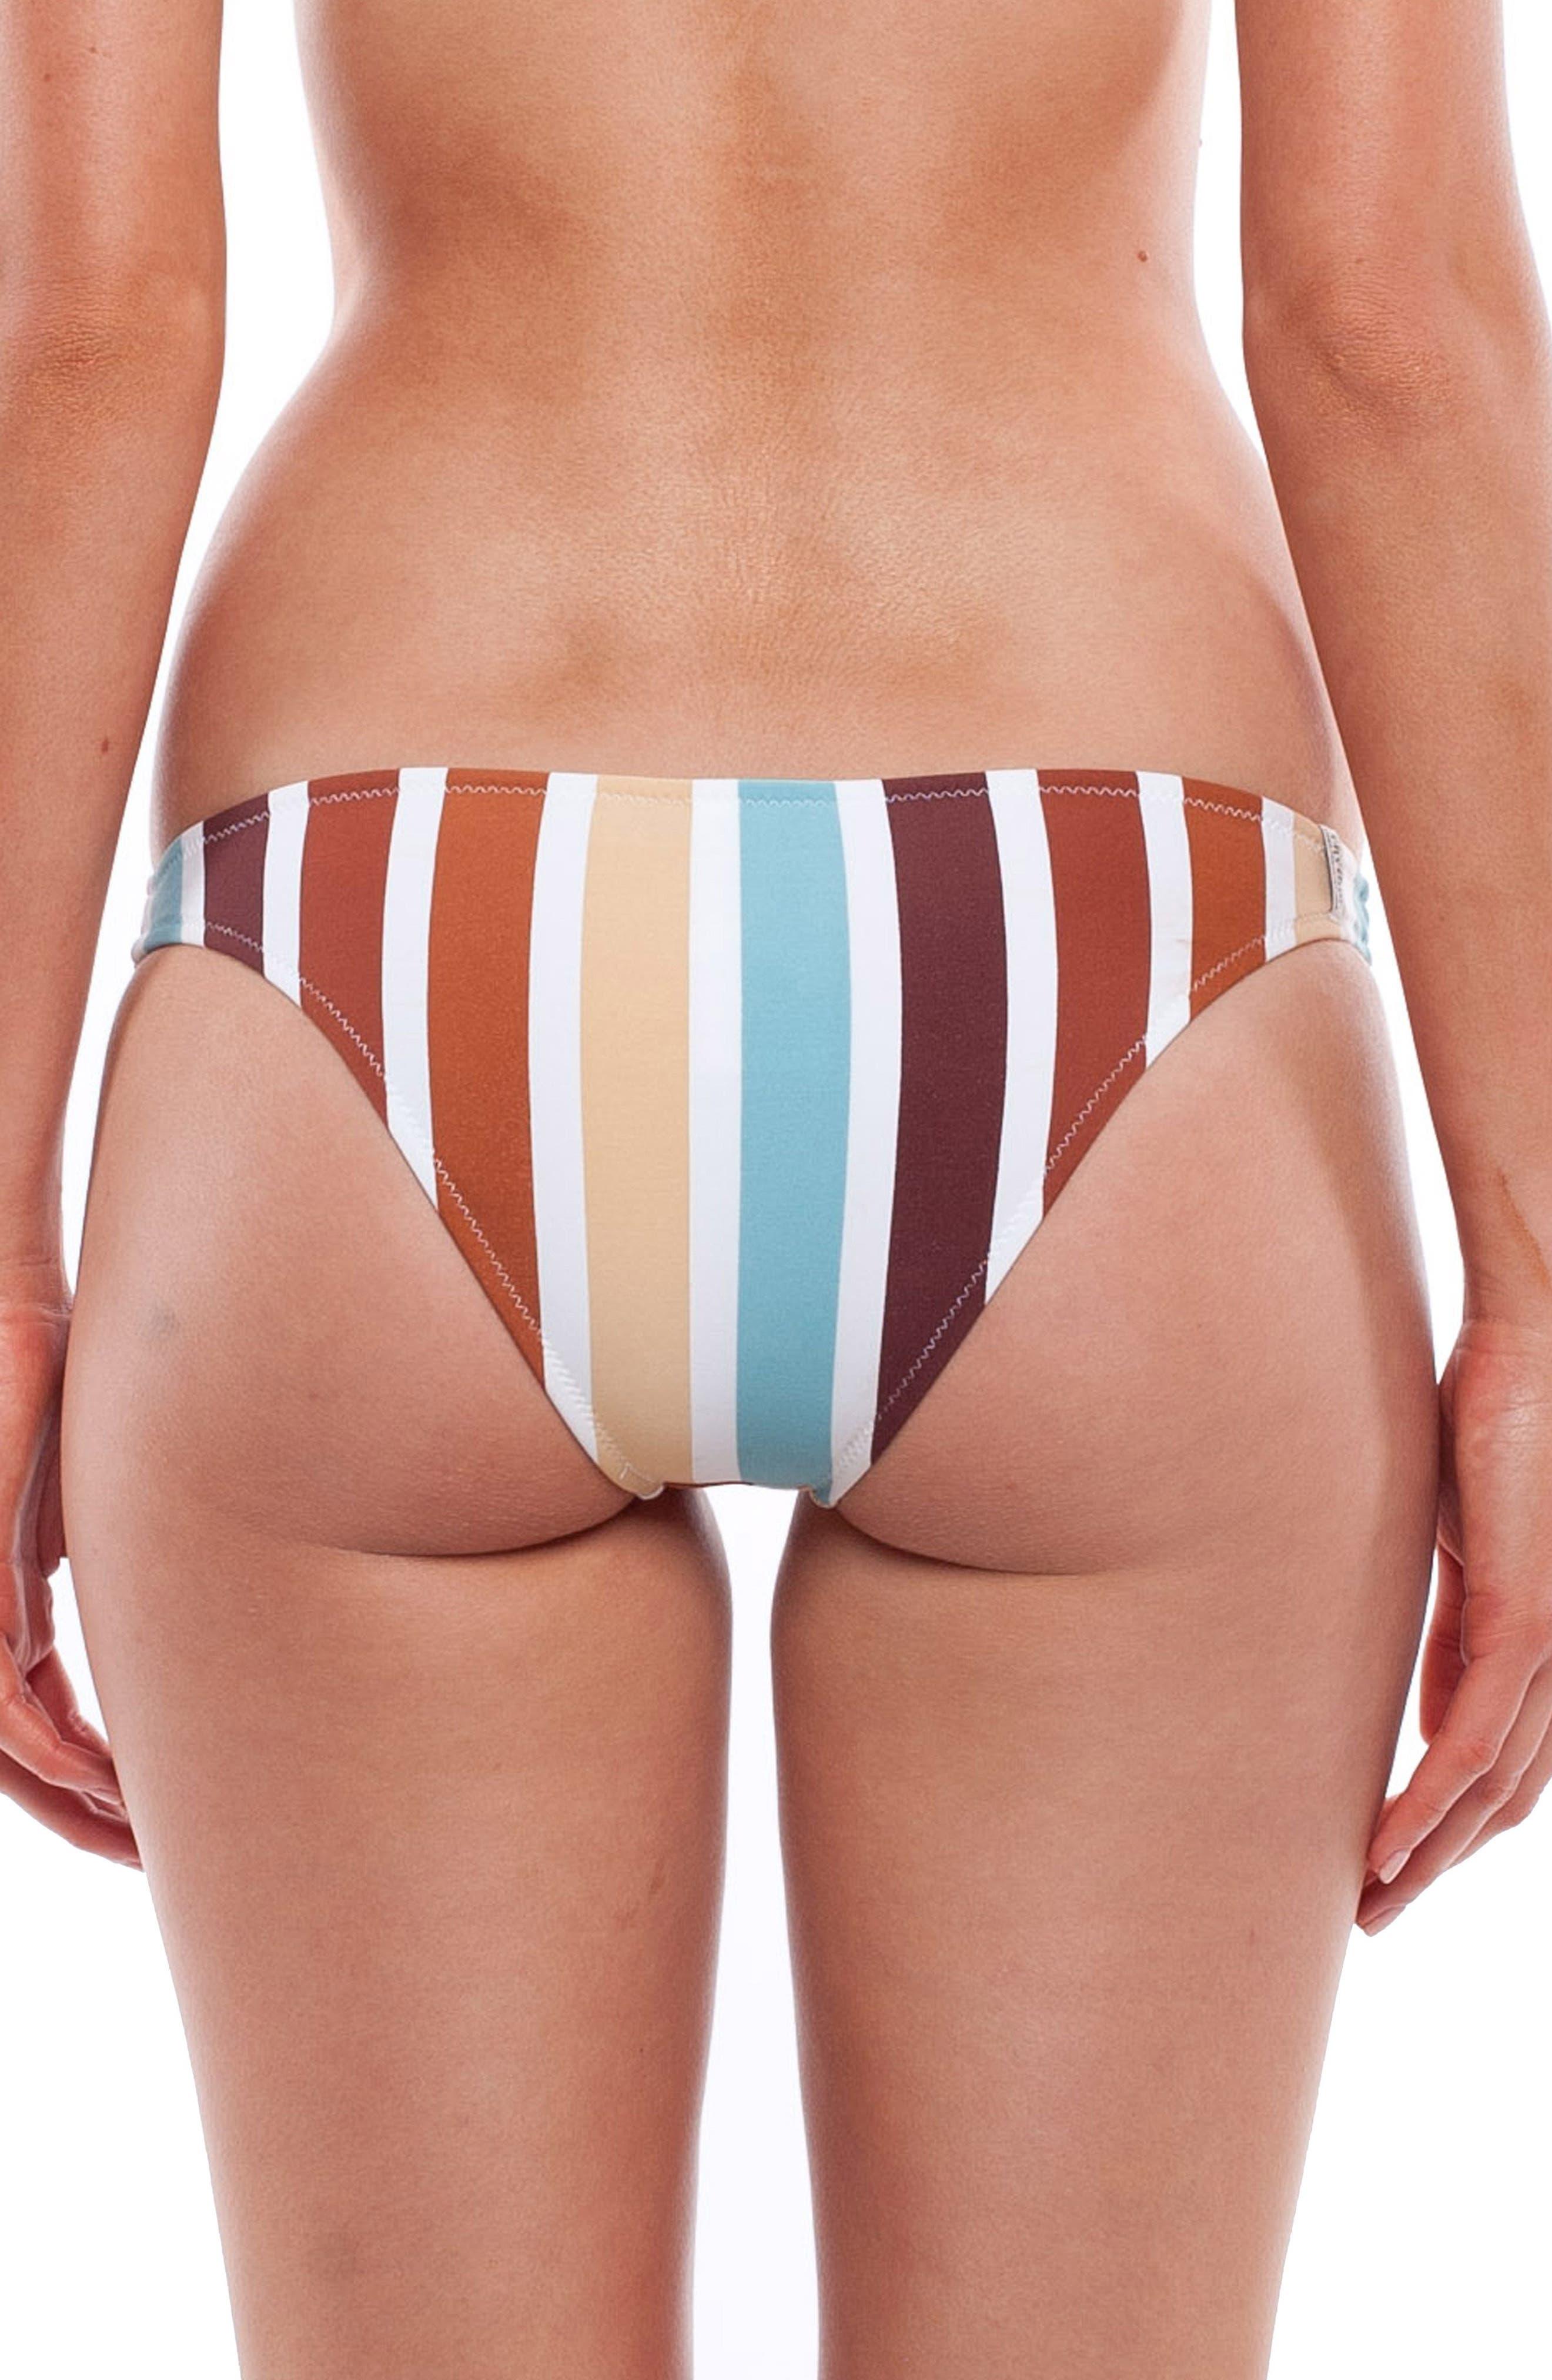 Zimbabwe Cheeky Bikini Bottoms,                             Main thumbnail 1, color,                             Blue Multi